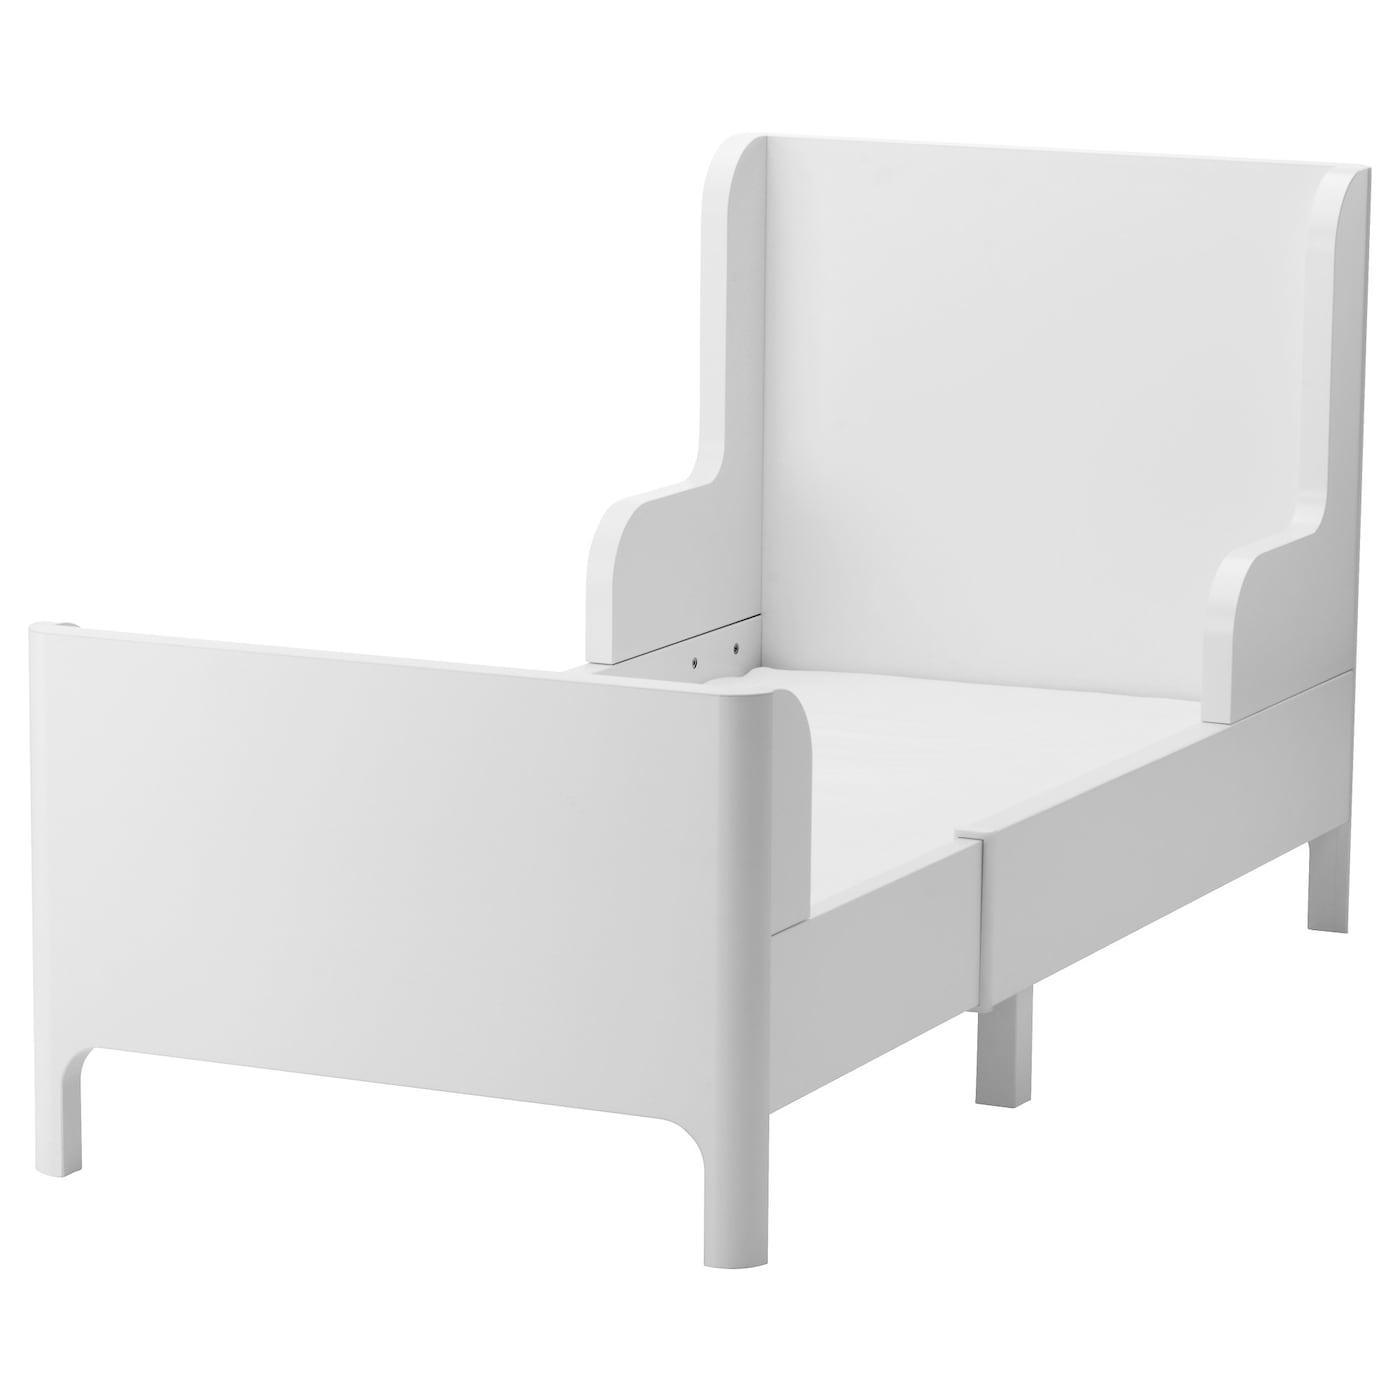 busunge lit extensible blanc 80x200 cm ikea. Black Bedroom Furniture Sets. Home Design Ideas